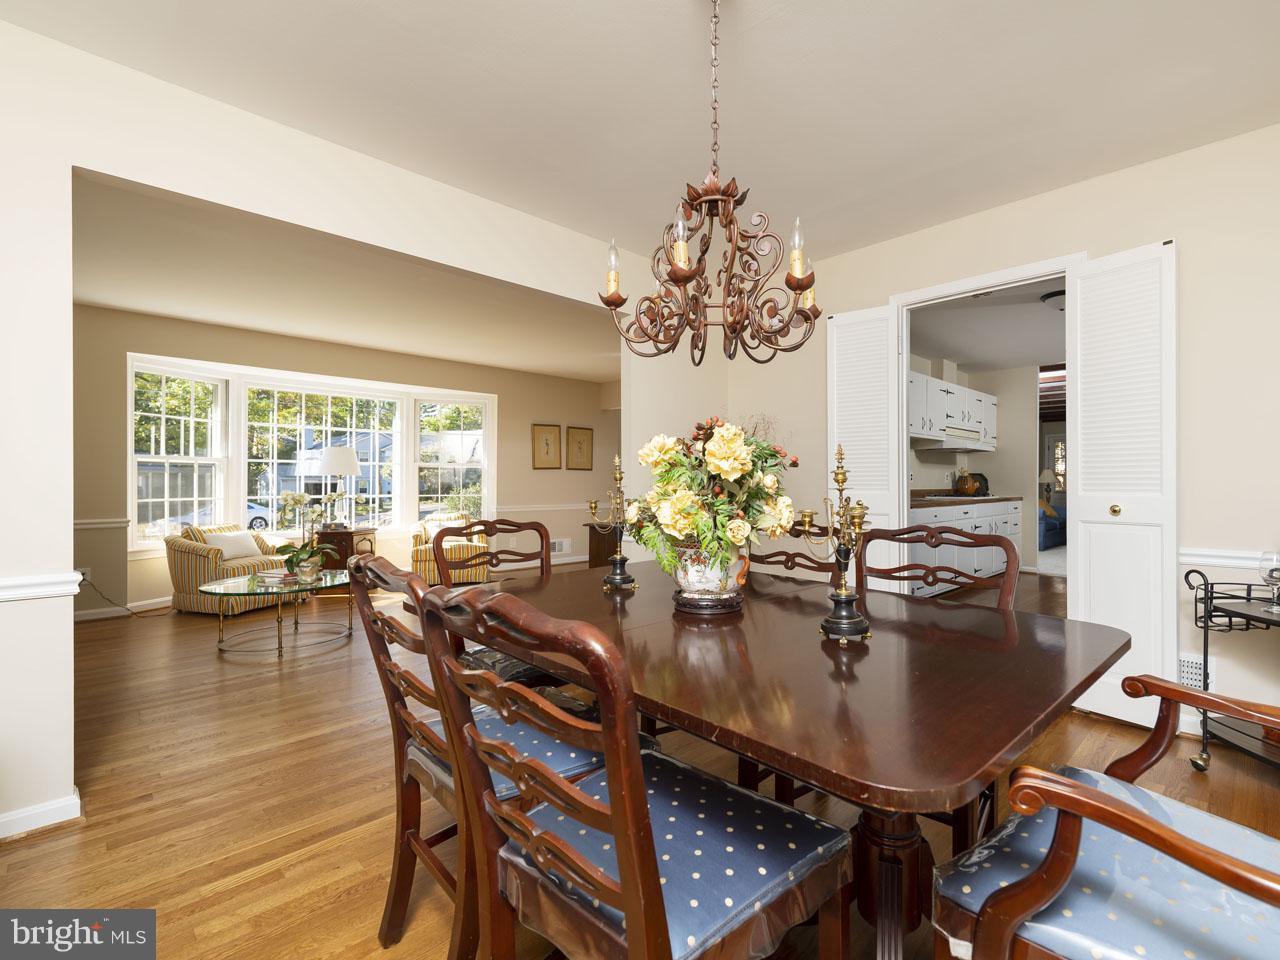 1010014728-300953032778-2021-09-05-13-50-28  |   | Annandale Delaware Real Estate For Sale | MLS# 1010014728  - Best of Northern Virginia